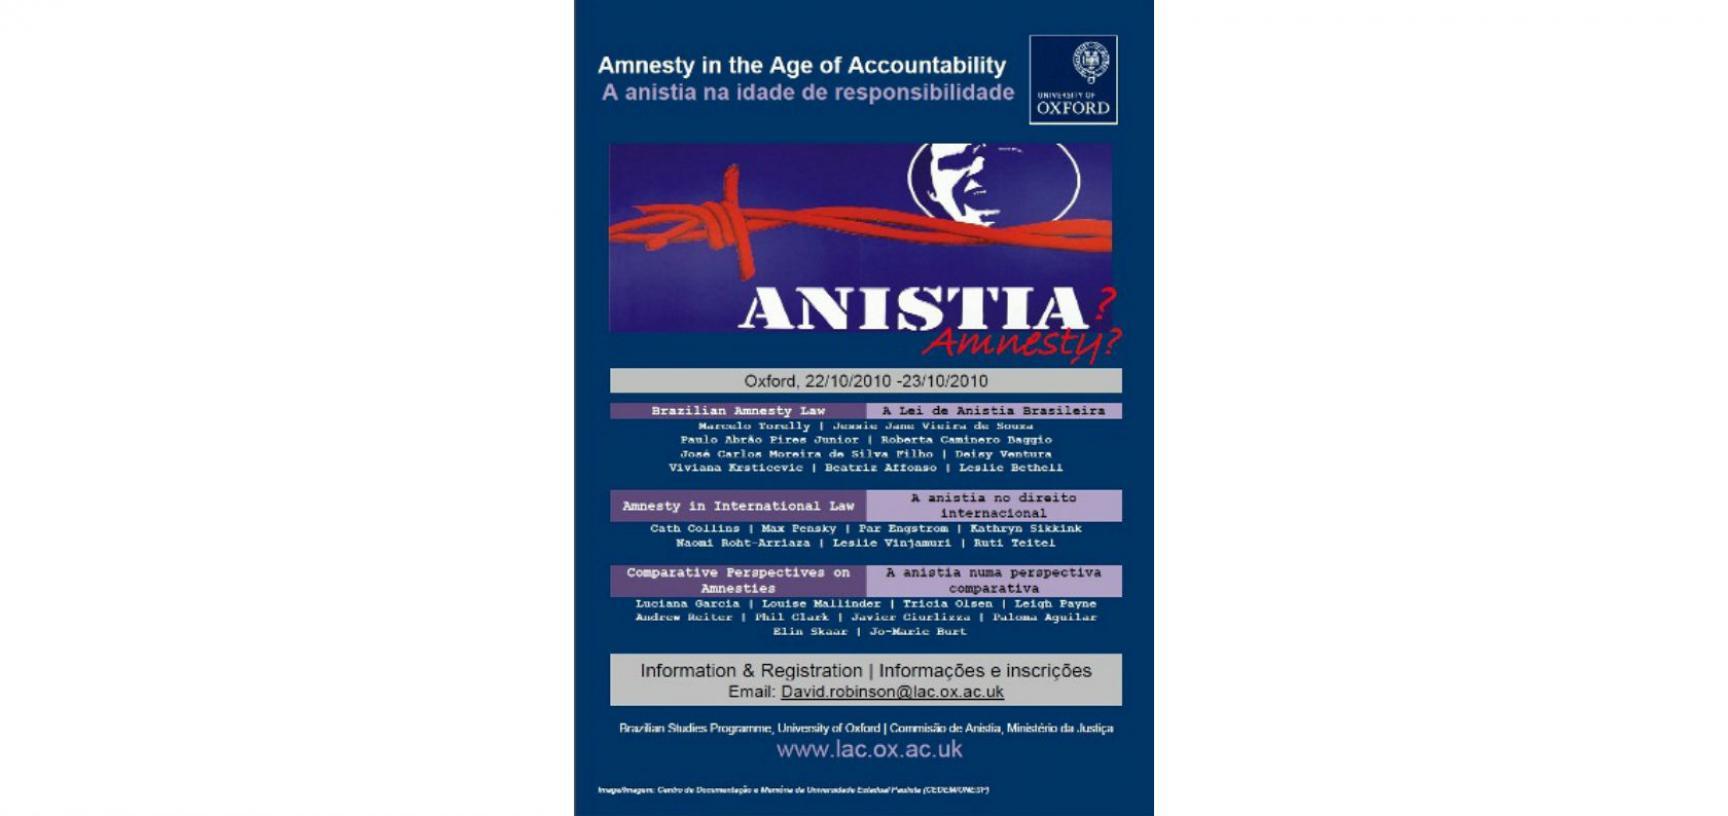 amnesty edit